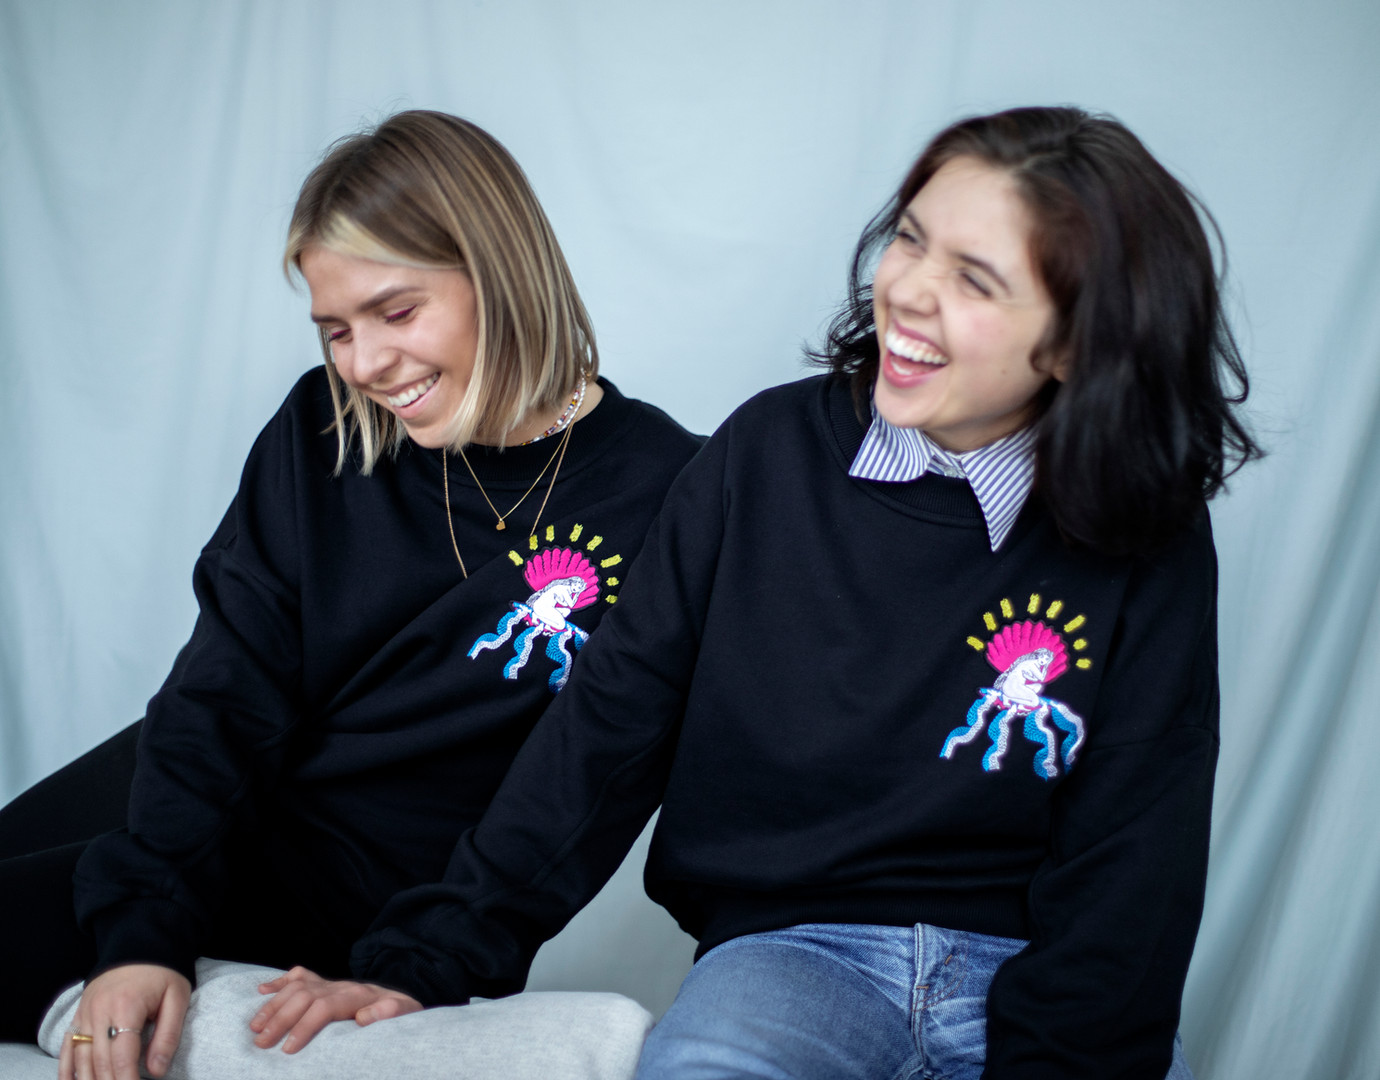 Women's džemperis su Migloko iliustracija Dear Freedom ir Dvi Tylos